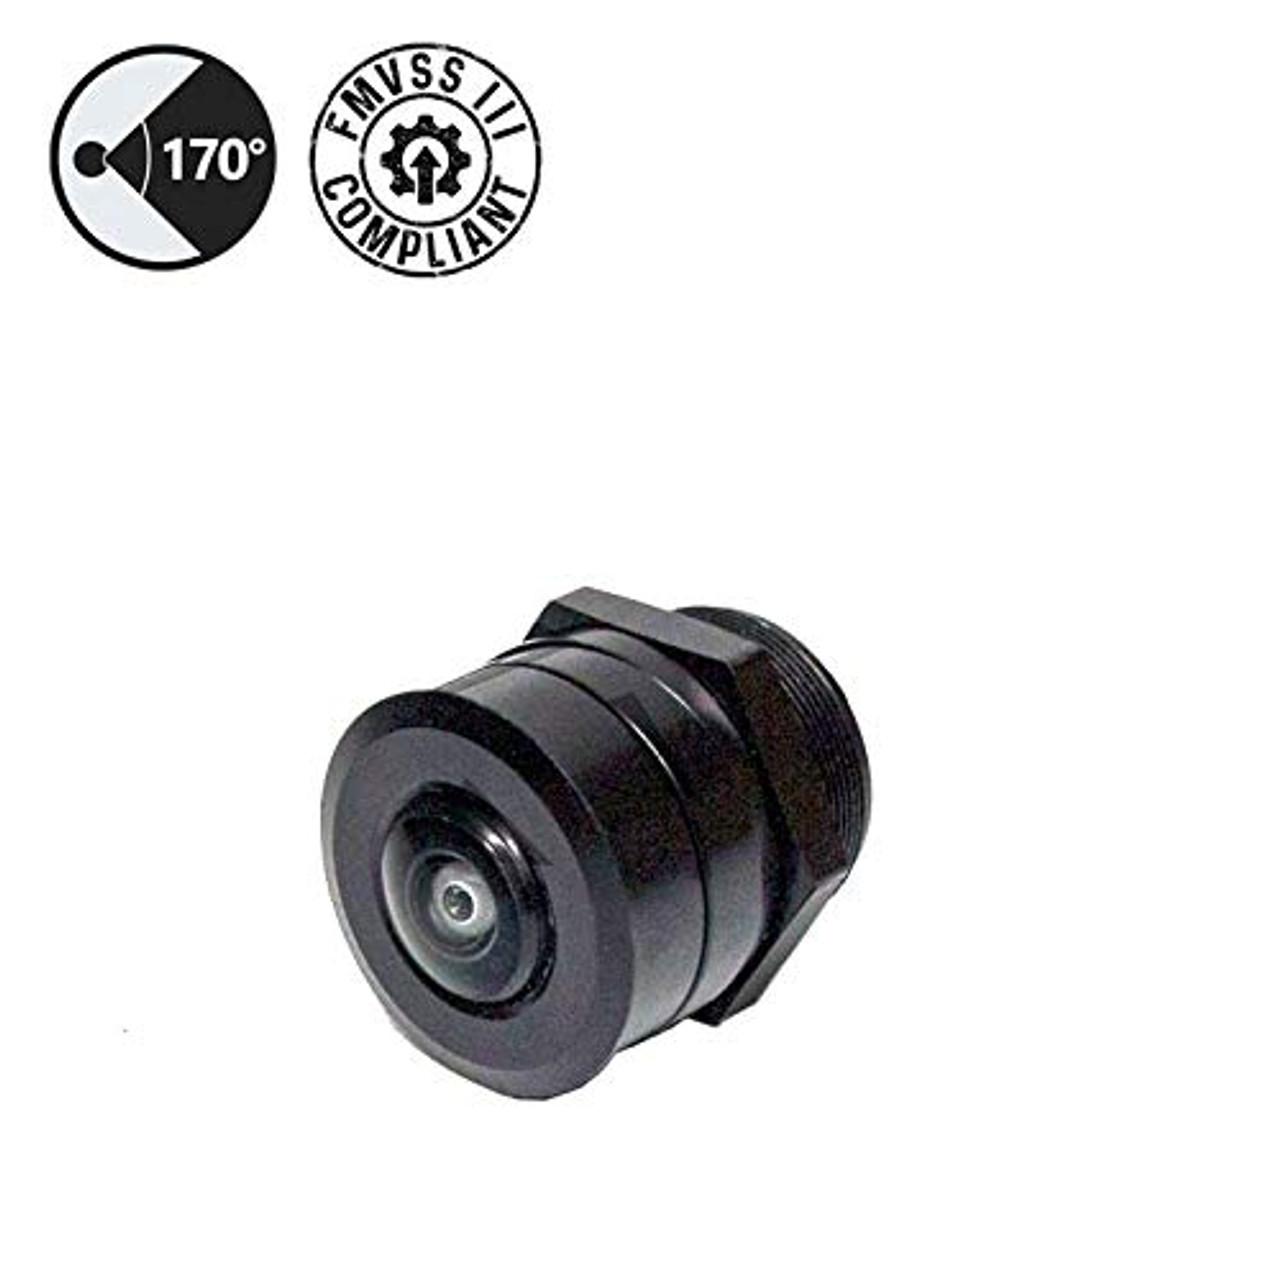 Flushmount Backup Camera (FMVSS 111 Compliant), 66' Cable, RCA Adapter | 1016VYOI1Z9